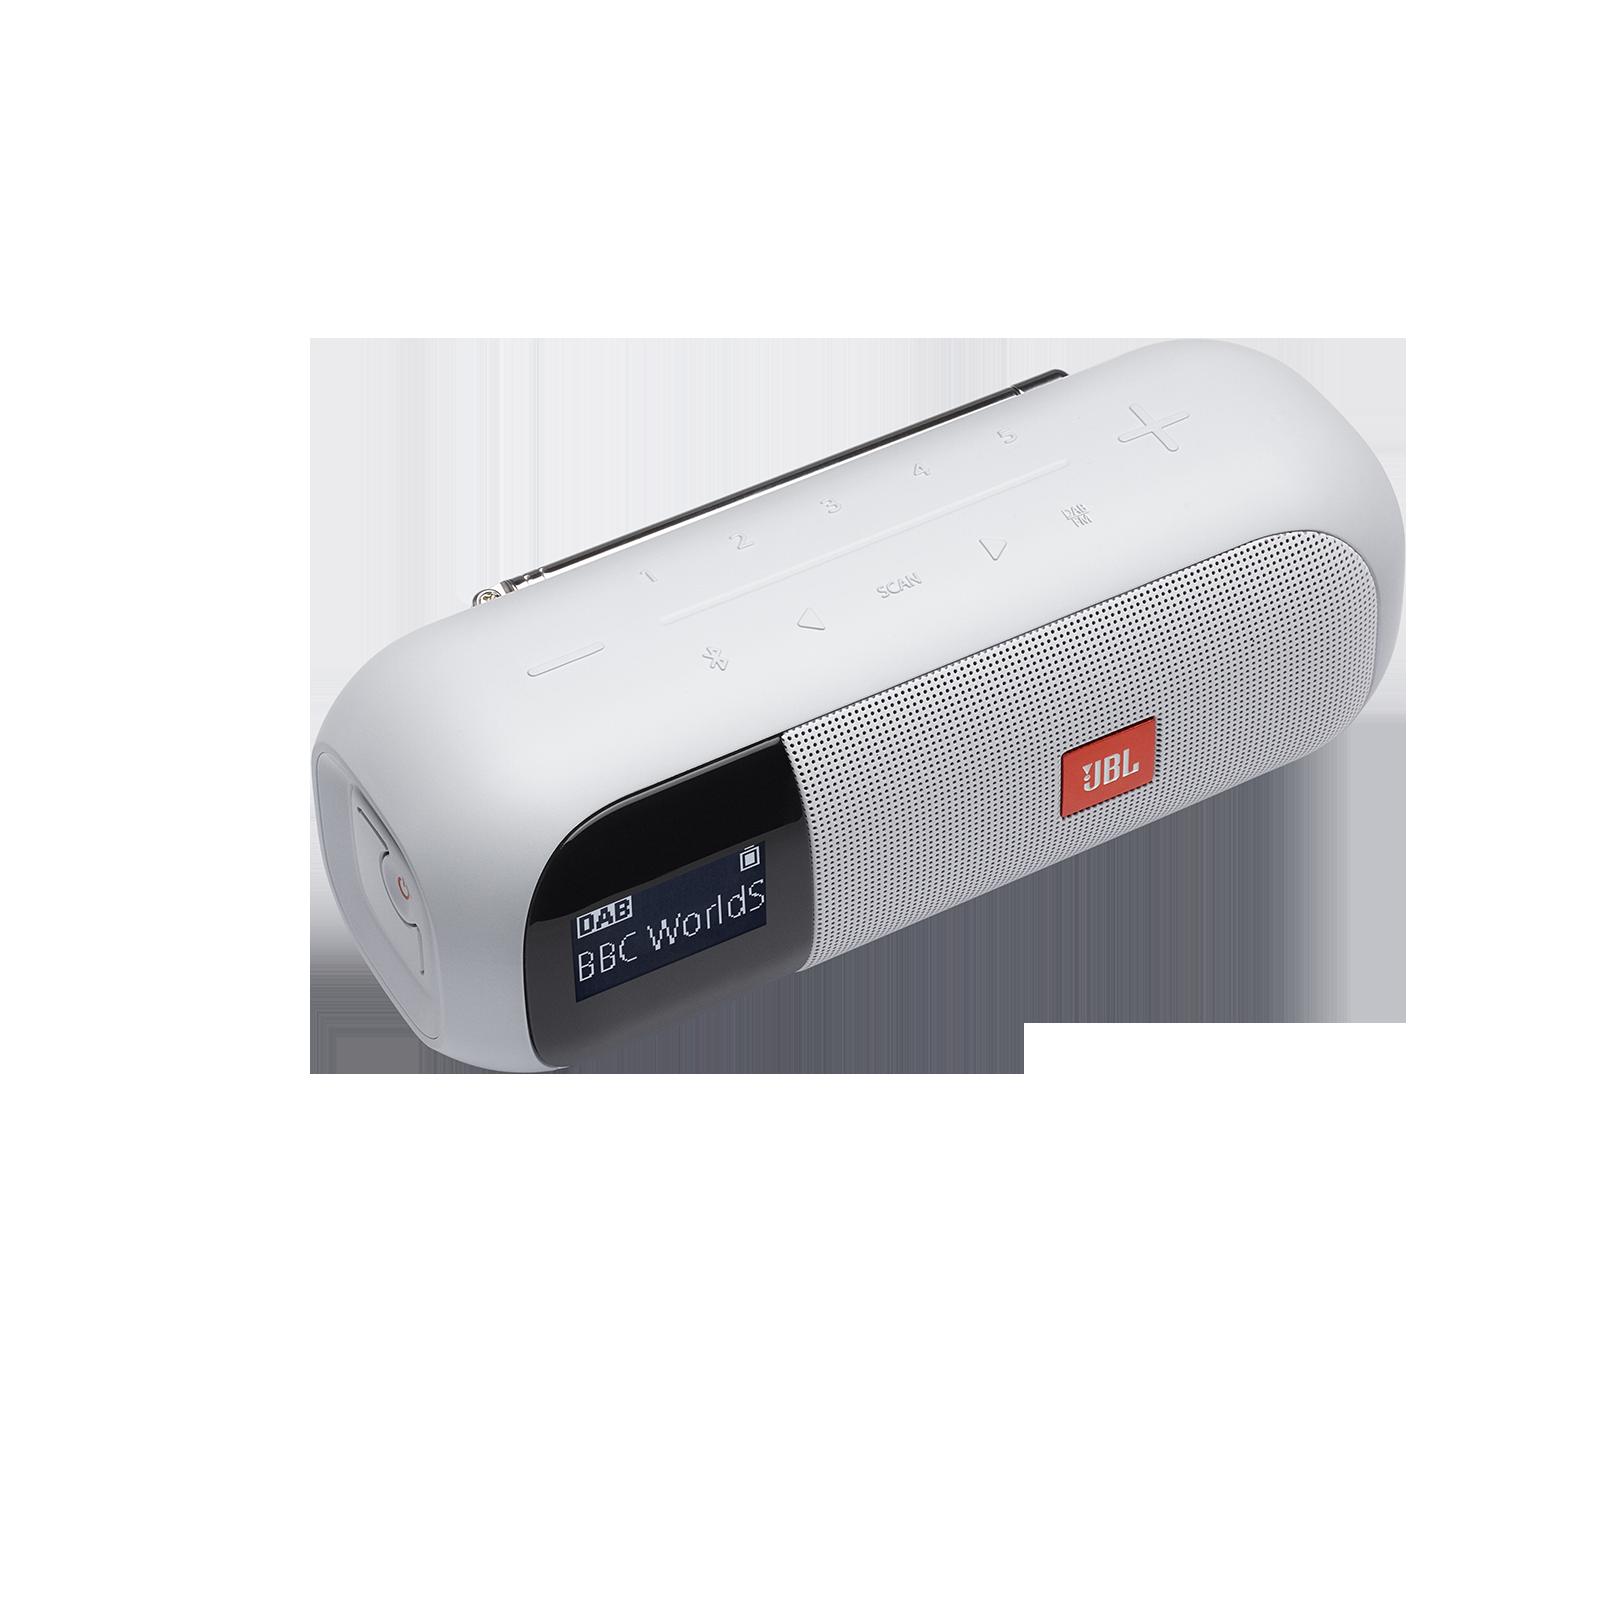 JBL Tuner 2 - White - Portable DAB/DAB+/FM radio with Bluetooth - Detailshot 1